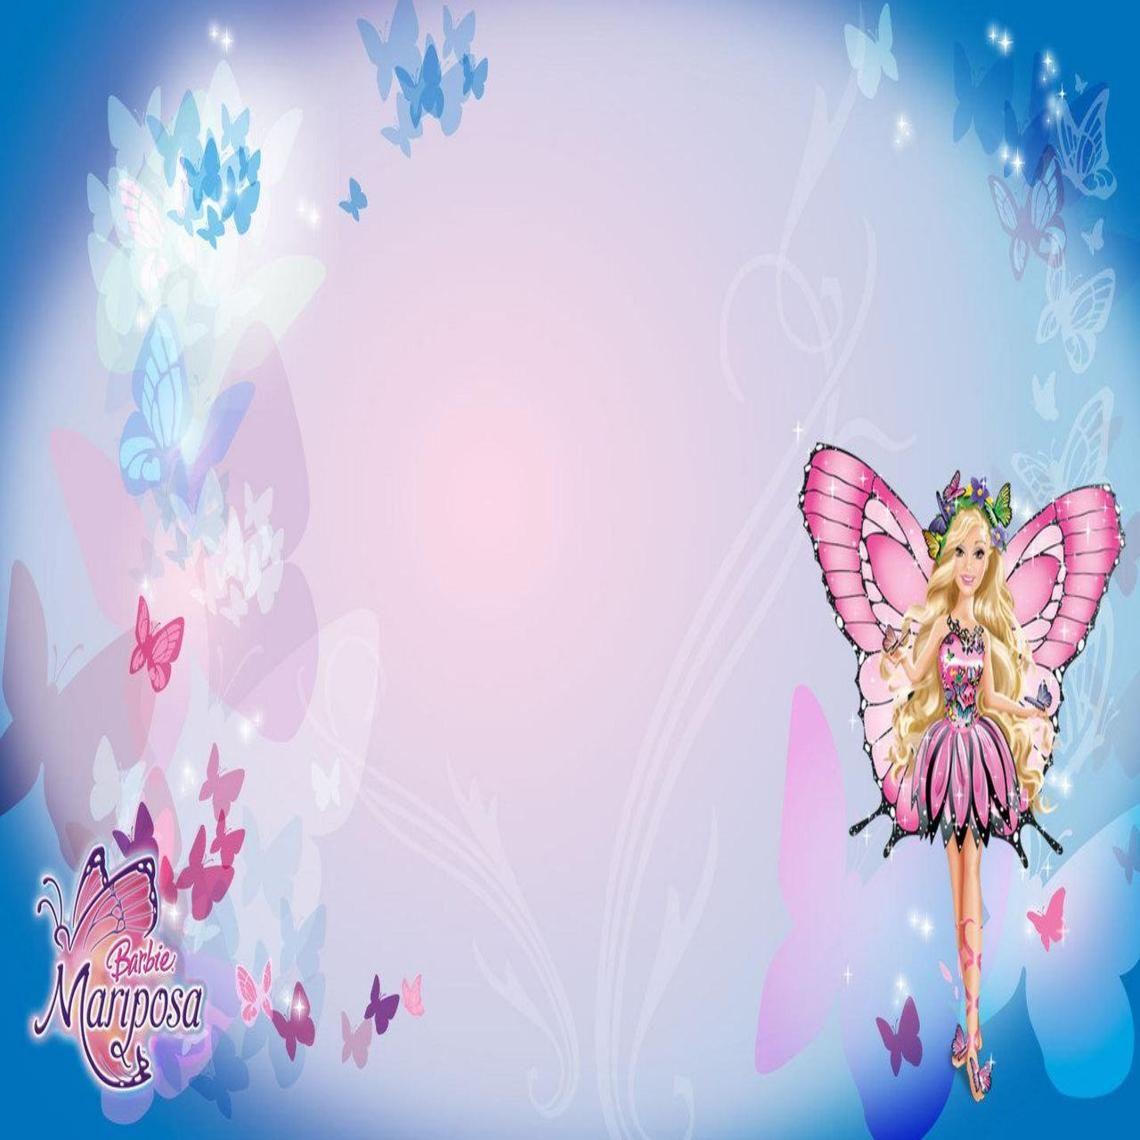 Barbie,Mariposa,Wallpaper,4 | wallpaper | Pinterest